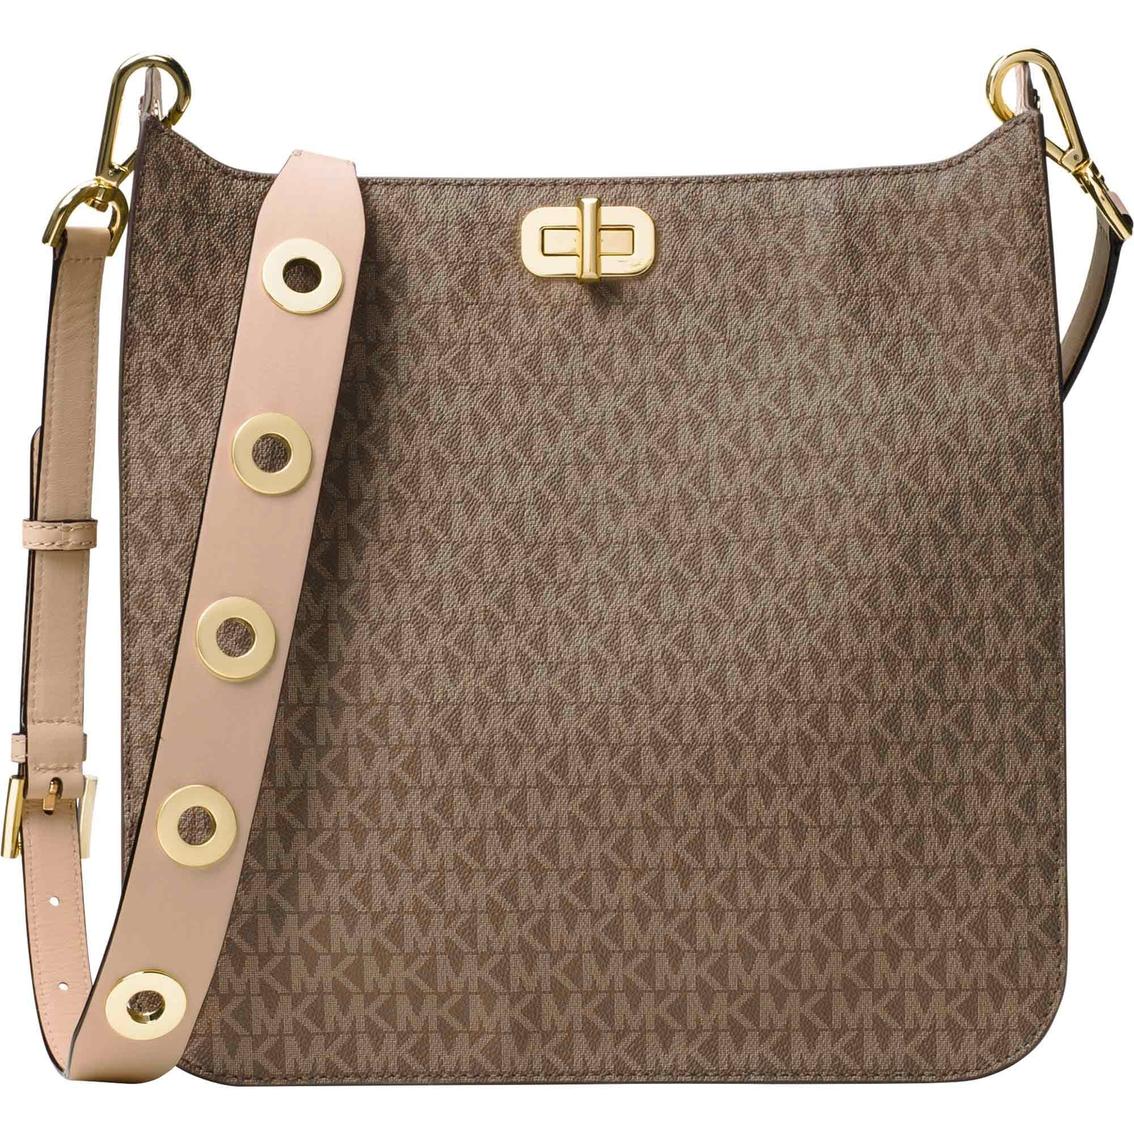 7a2a3eadf25f Michael Kors Sullivan Large North South Messenger Handbag